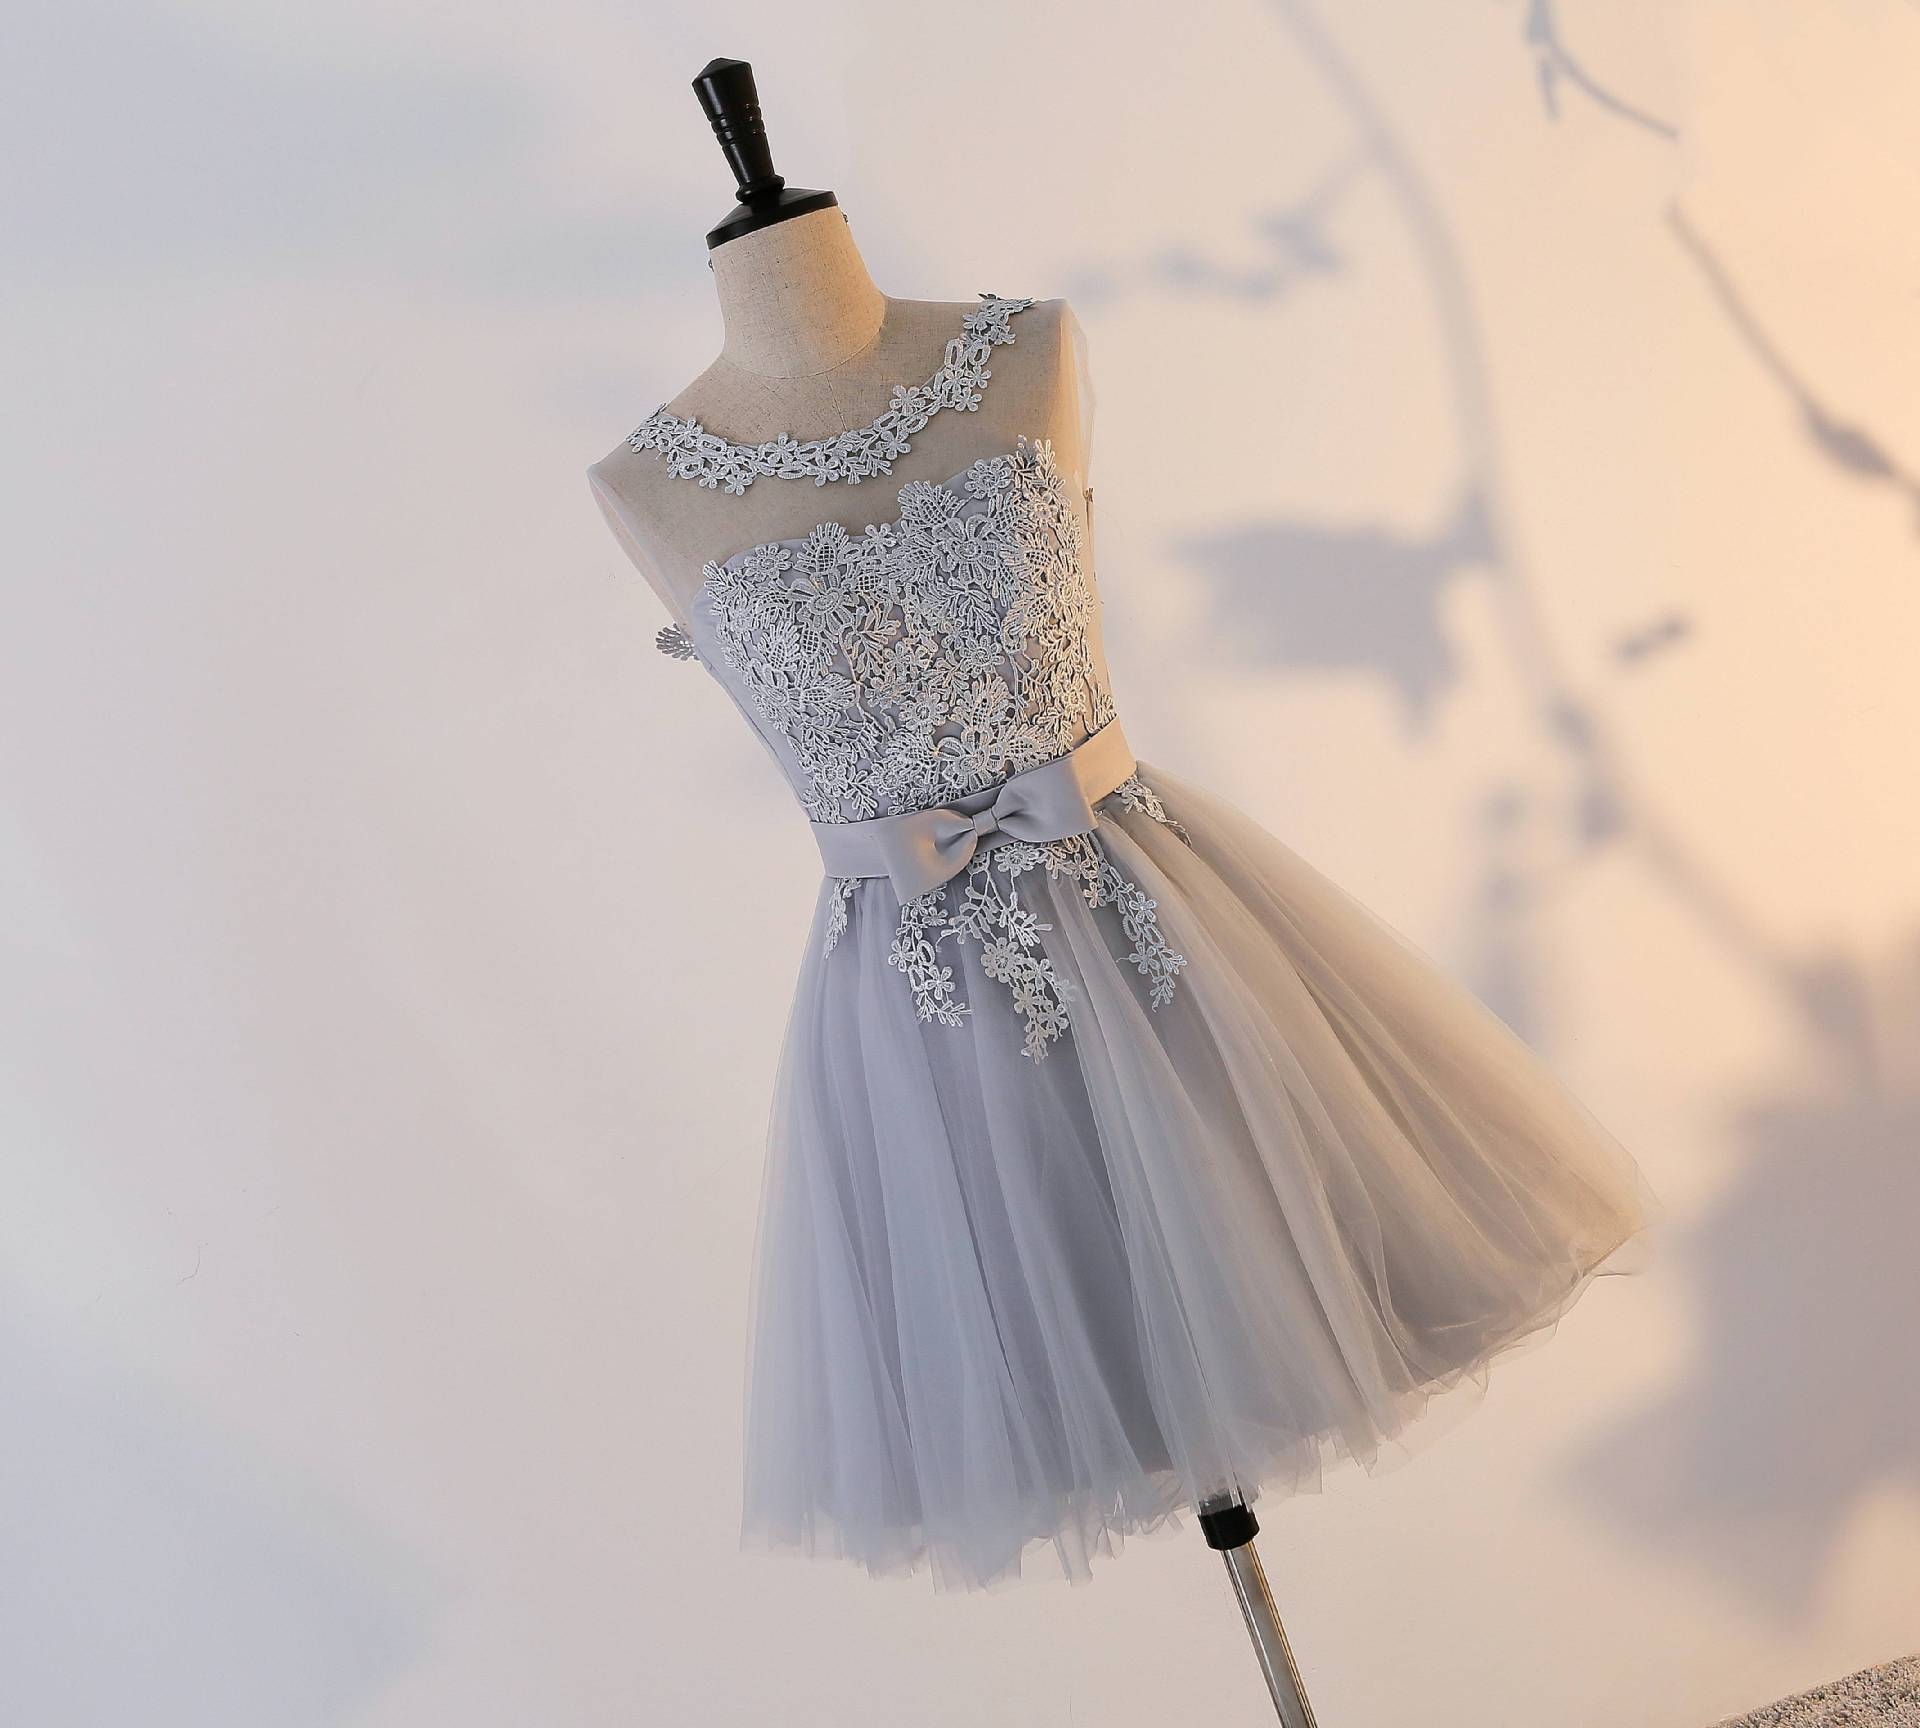 Sem Encosto Regresso A Casa Curto Vestidos Com Arco vestidos de festa